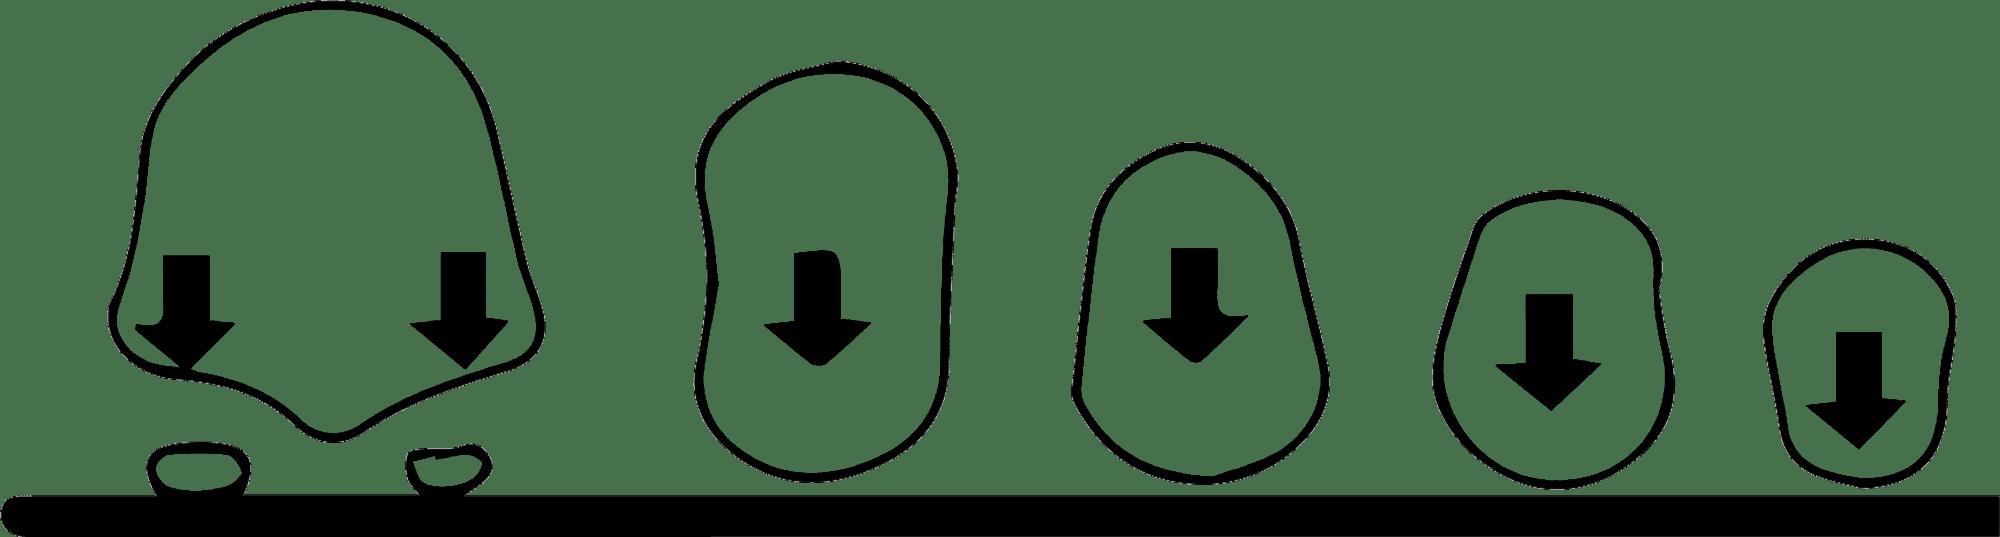 Metatarsiano alineado